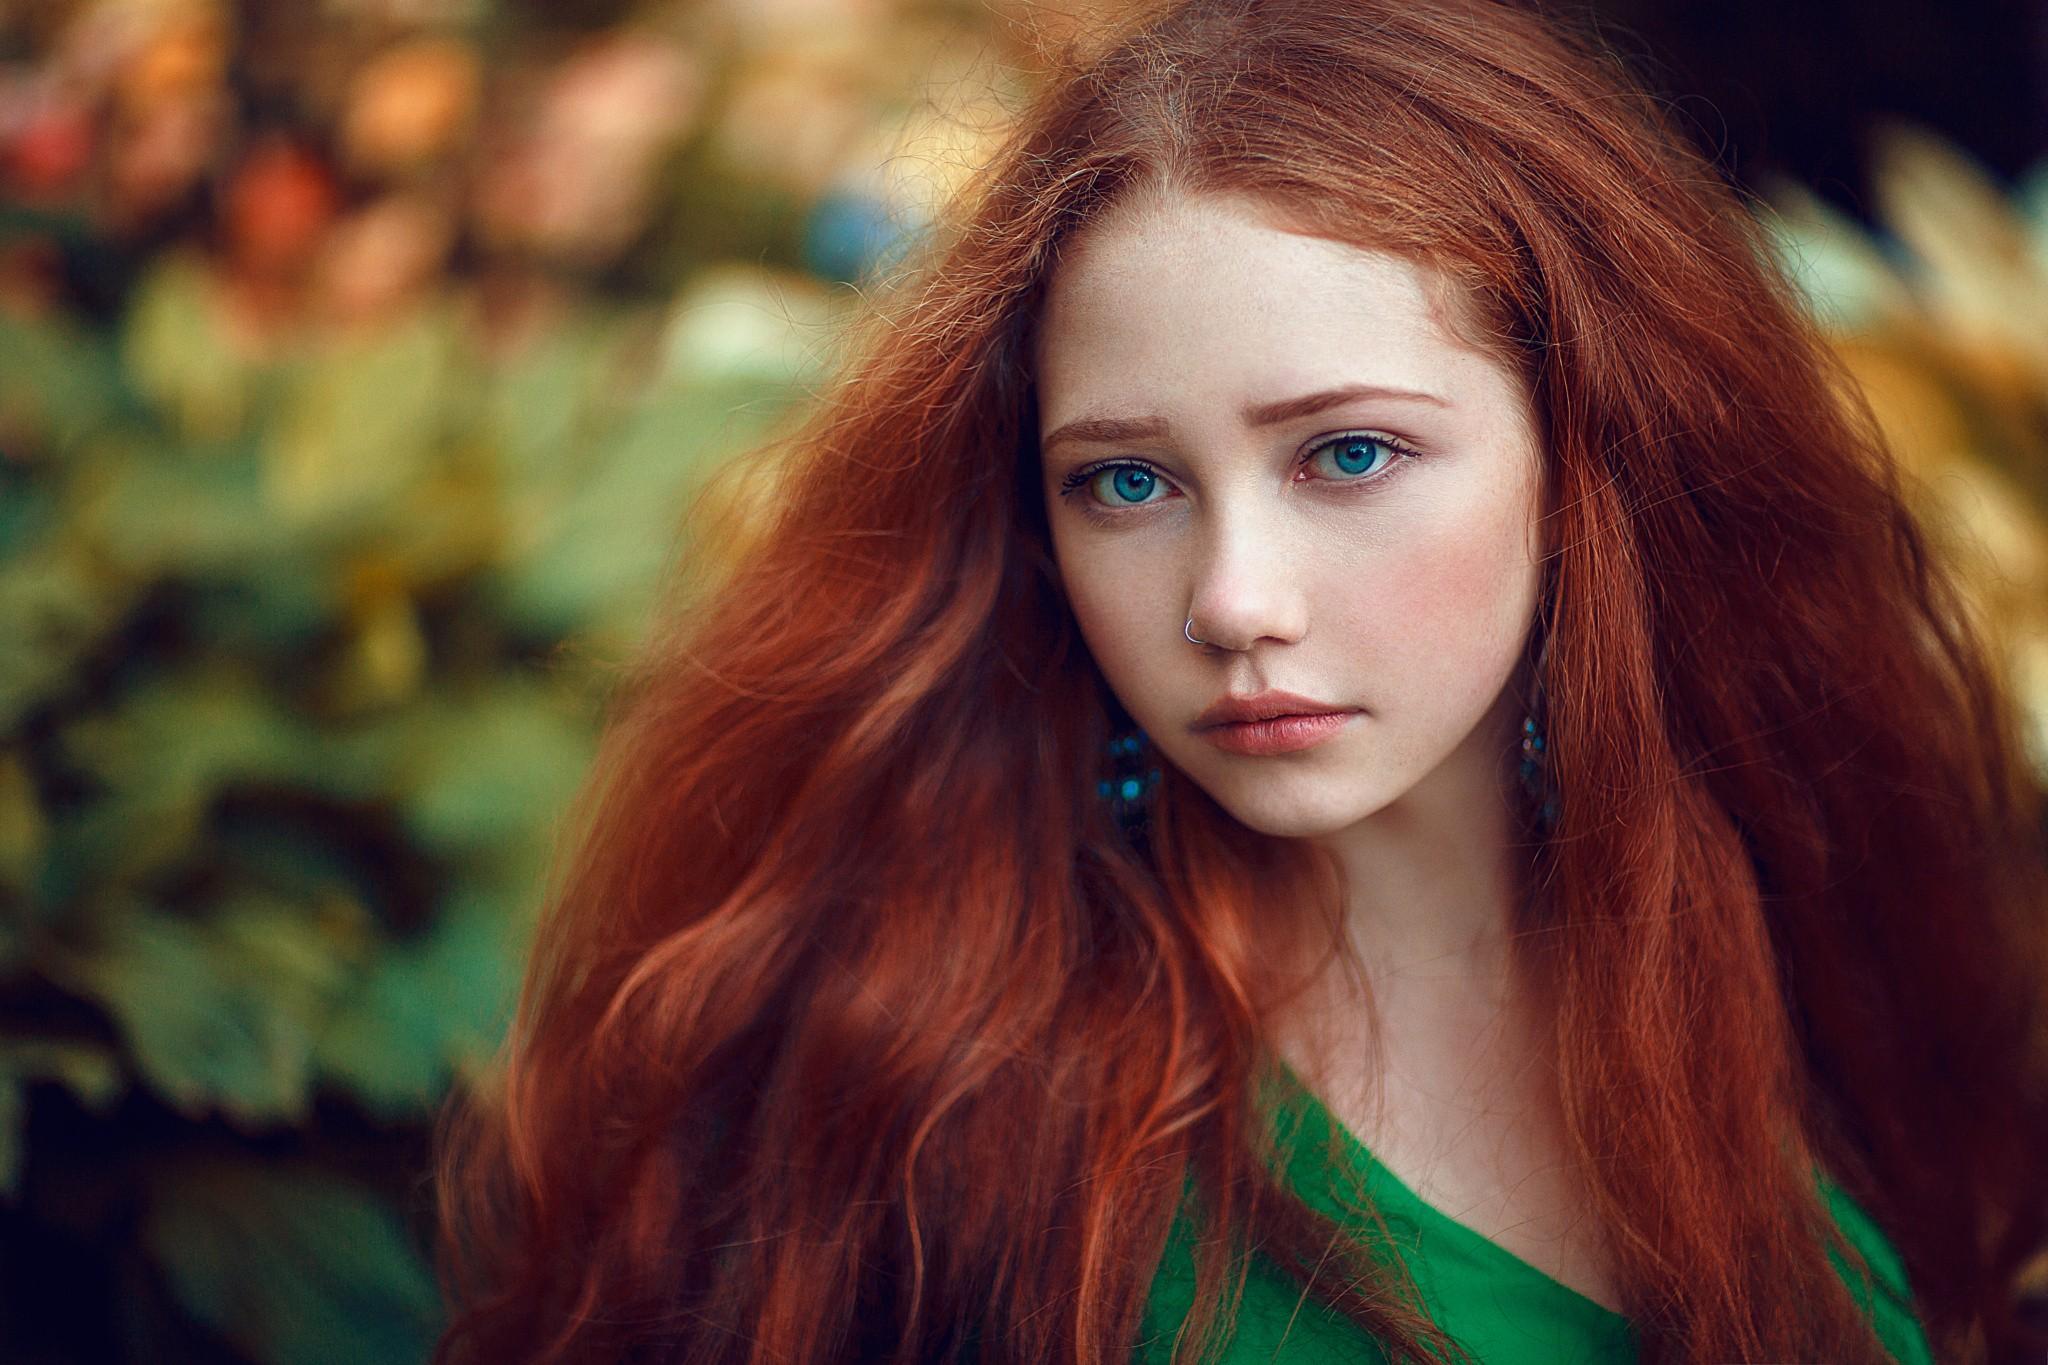 wallpaper face women outdoors redhead model depth of. Black Bedroom Furniture Sets. Home Design Ideas